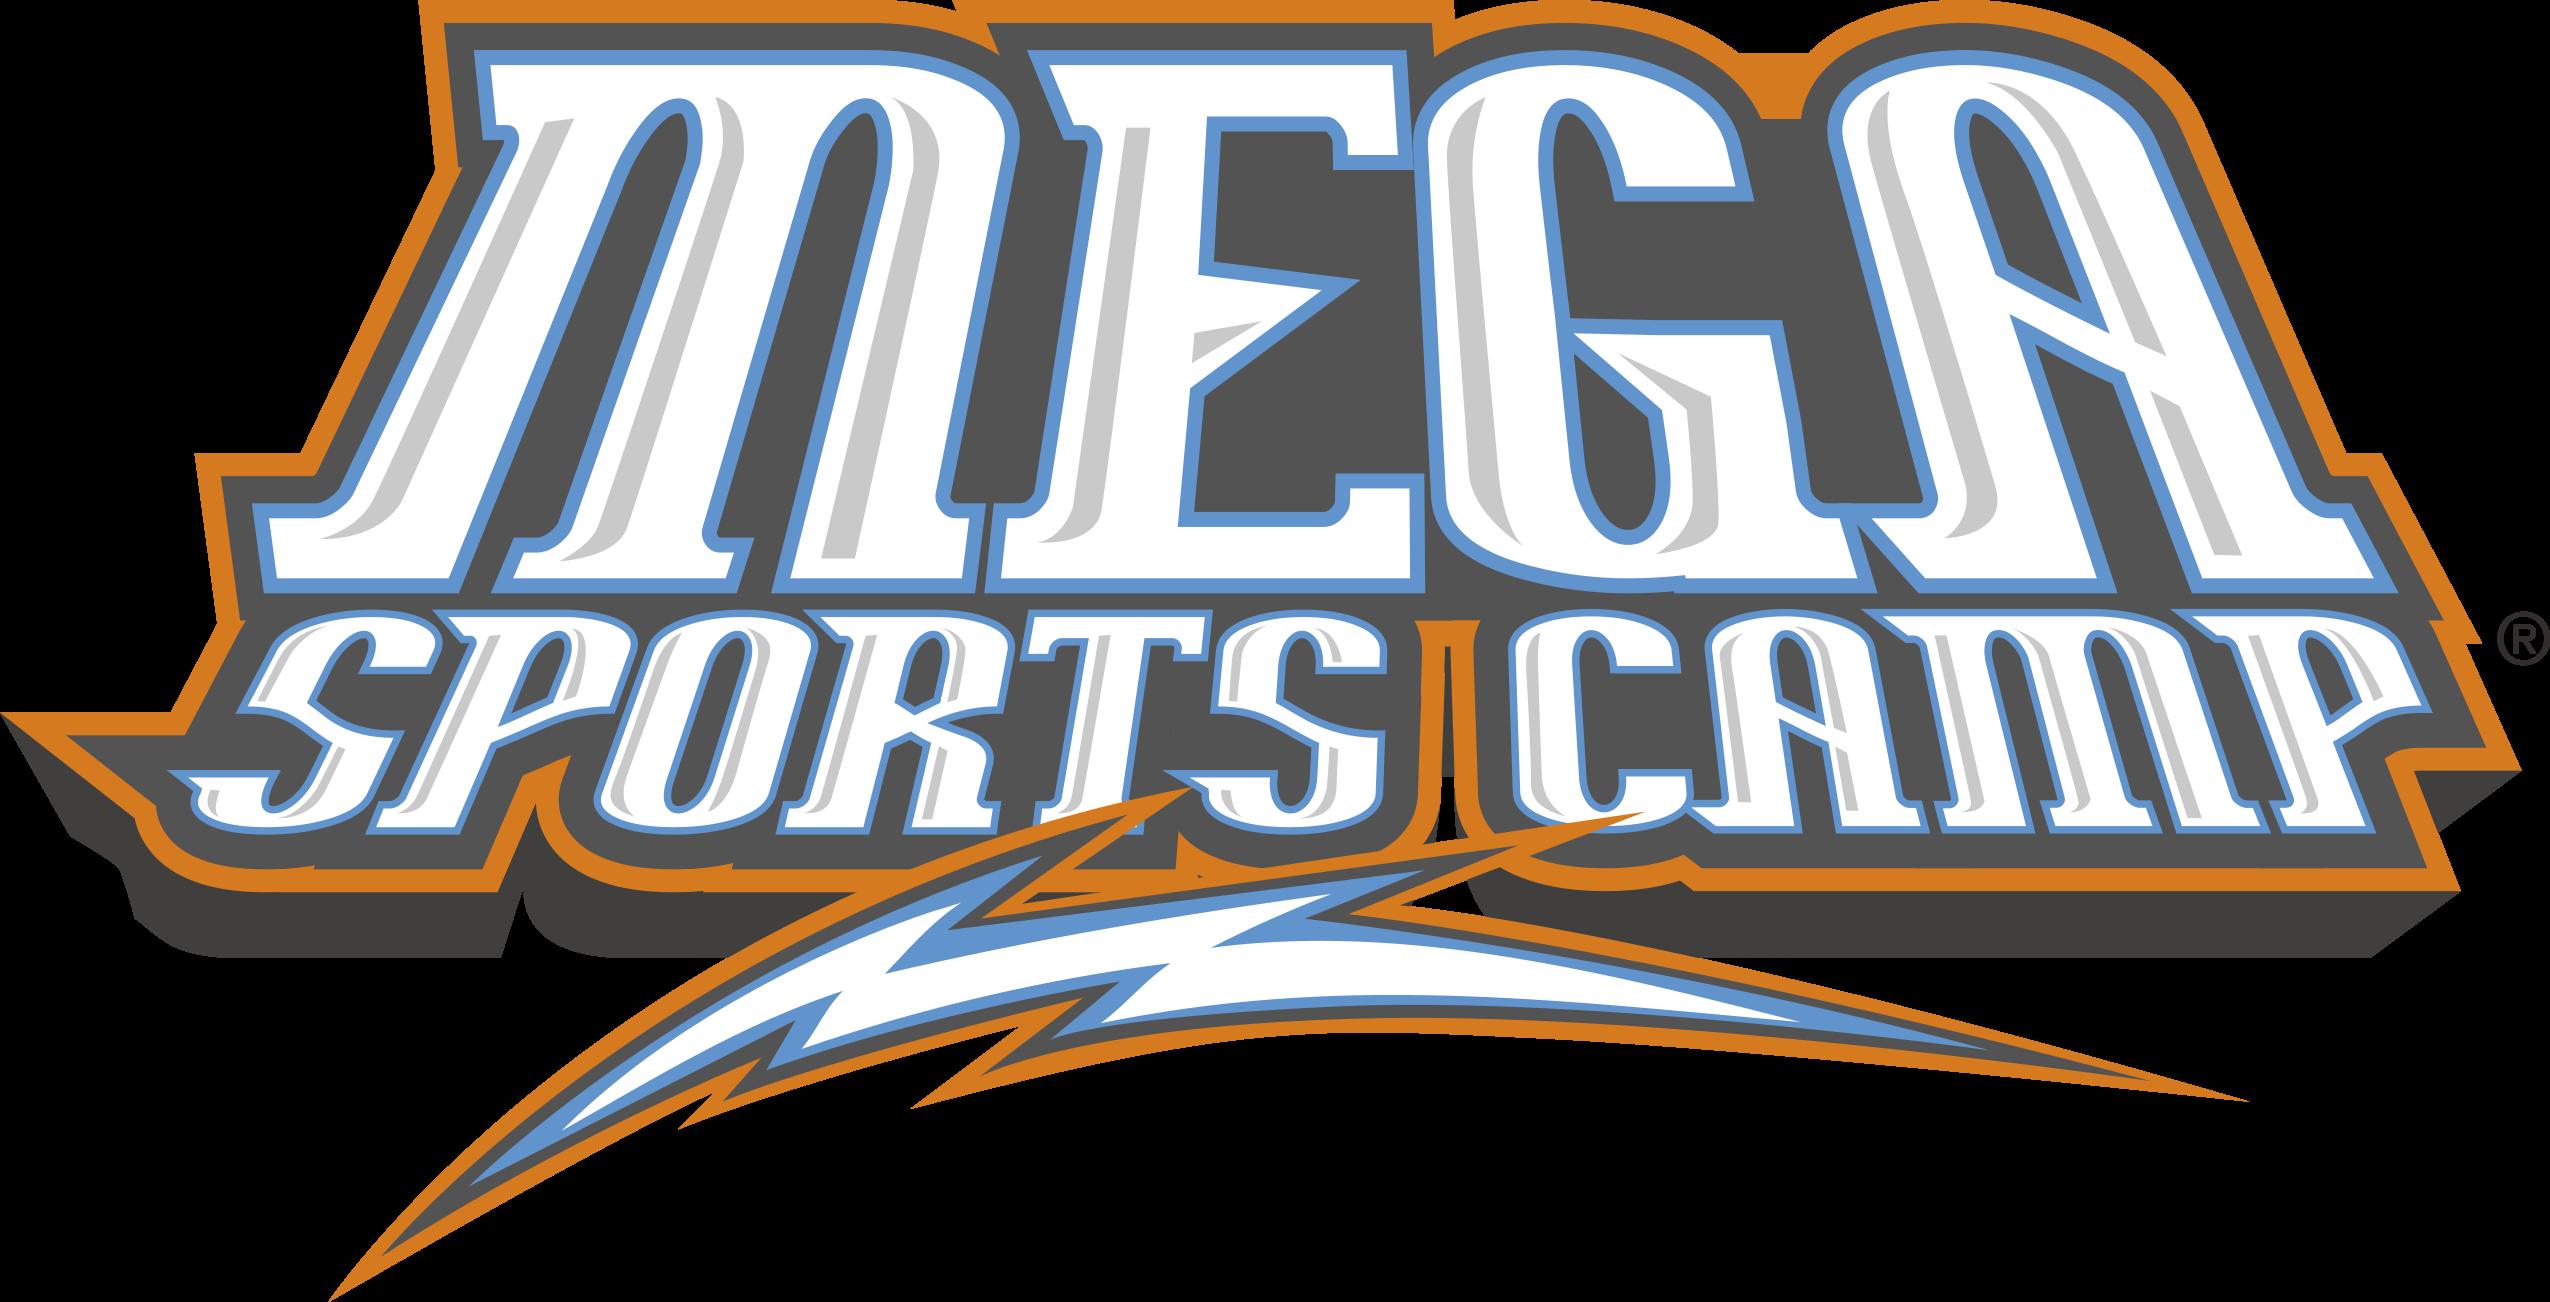 Logo mega scamp